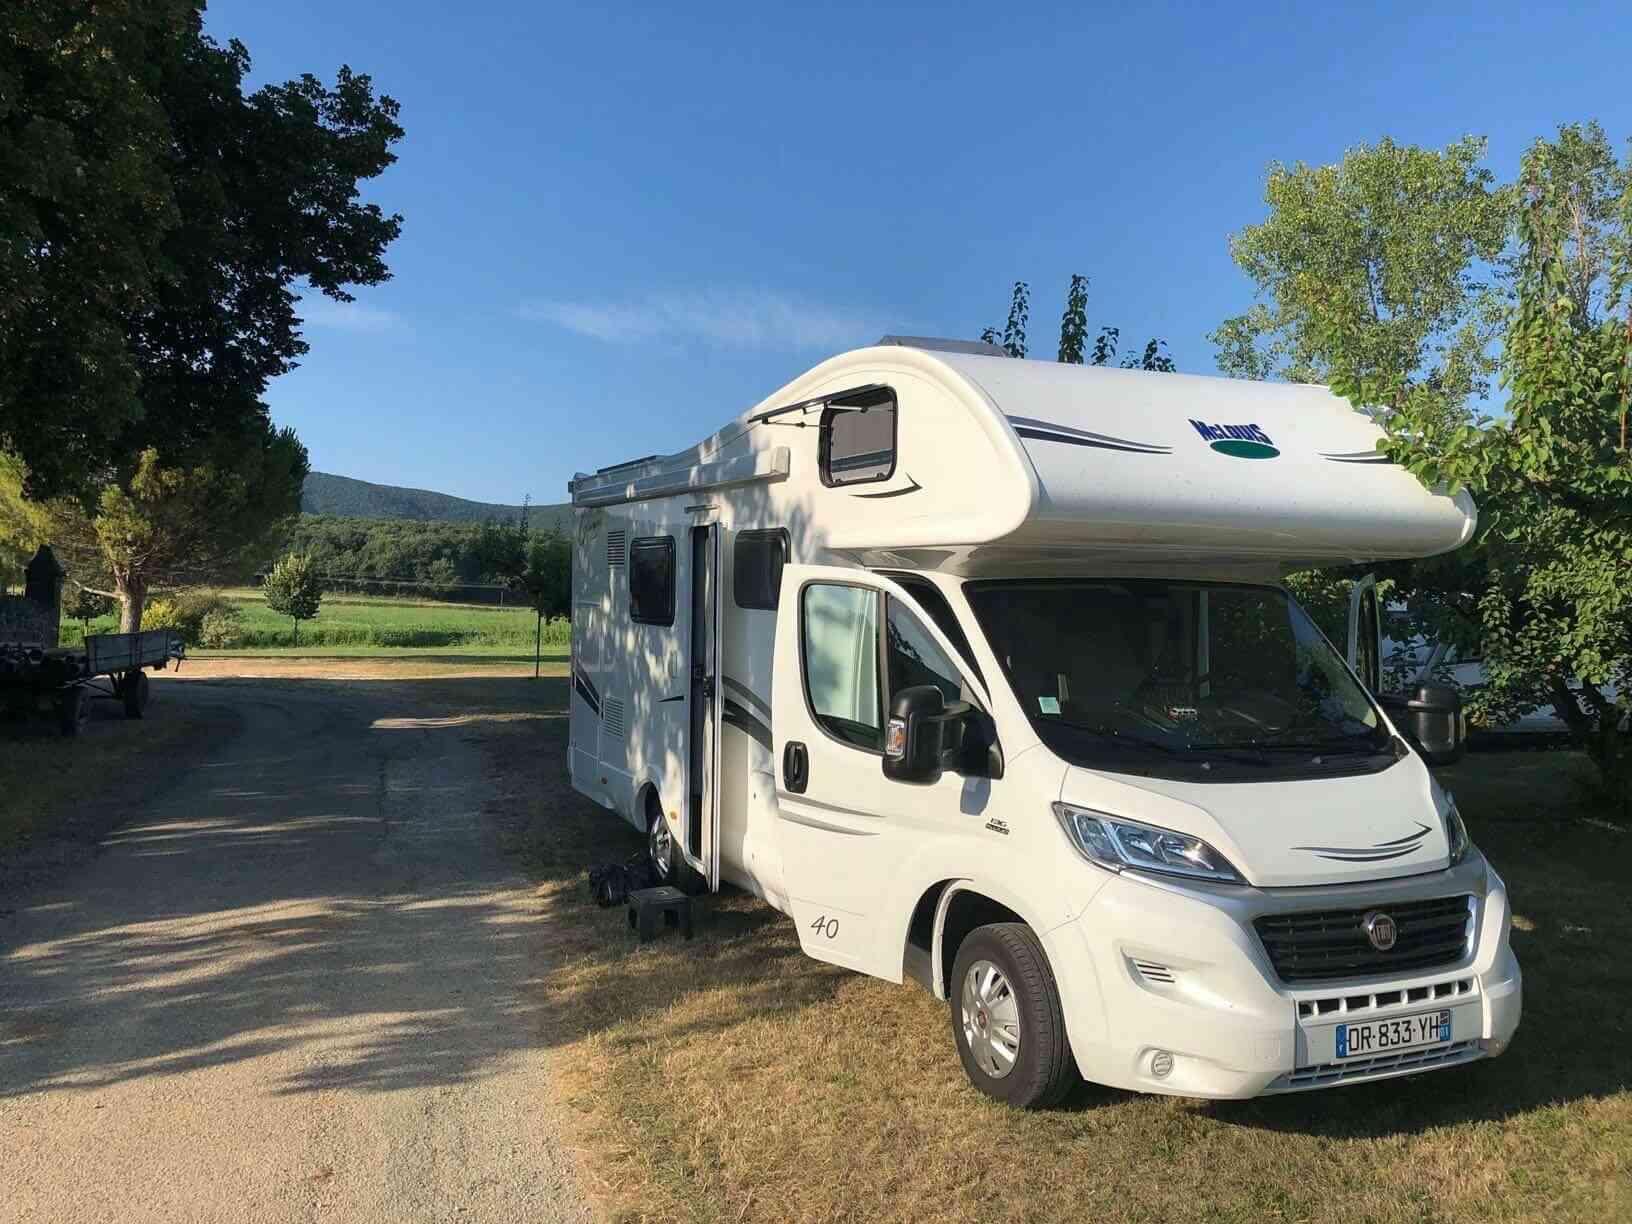 camping-car MC LOUIS GLAMYS 40